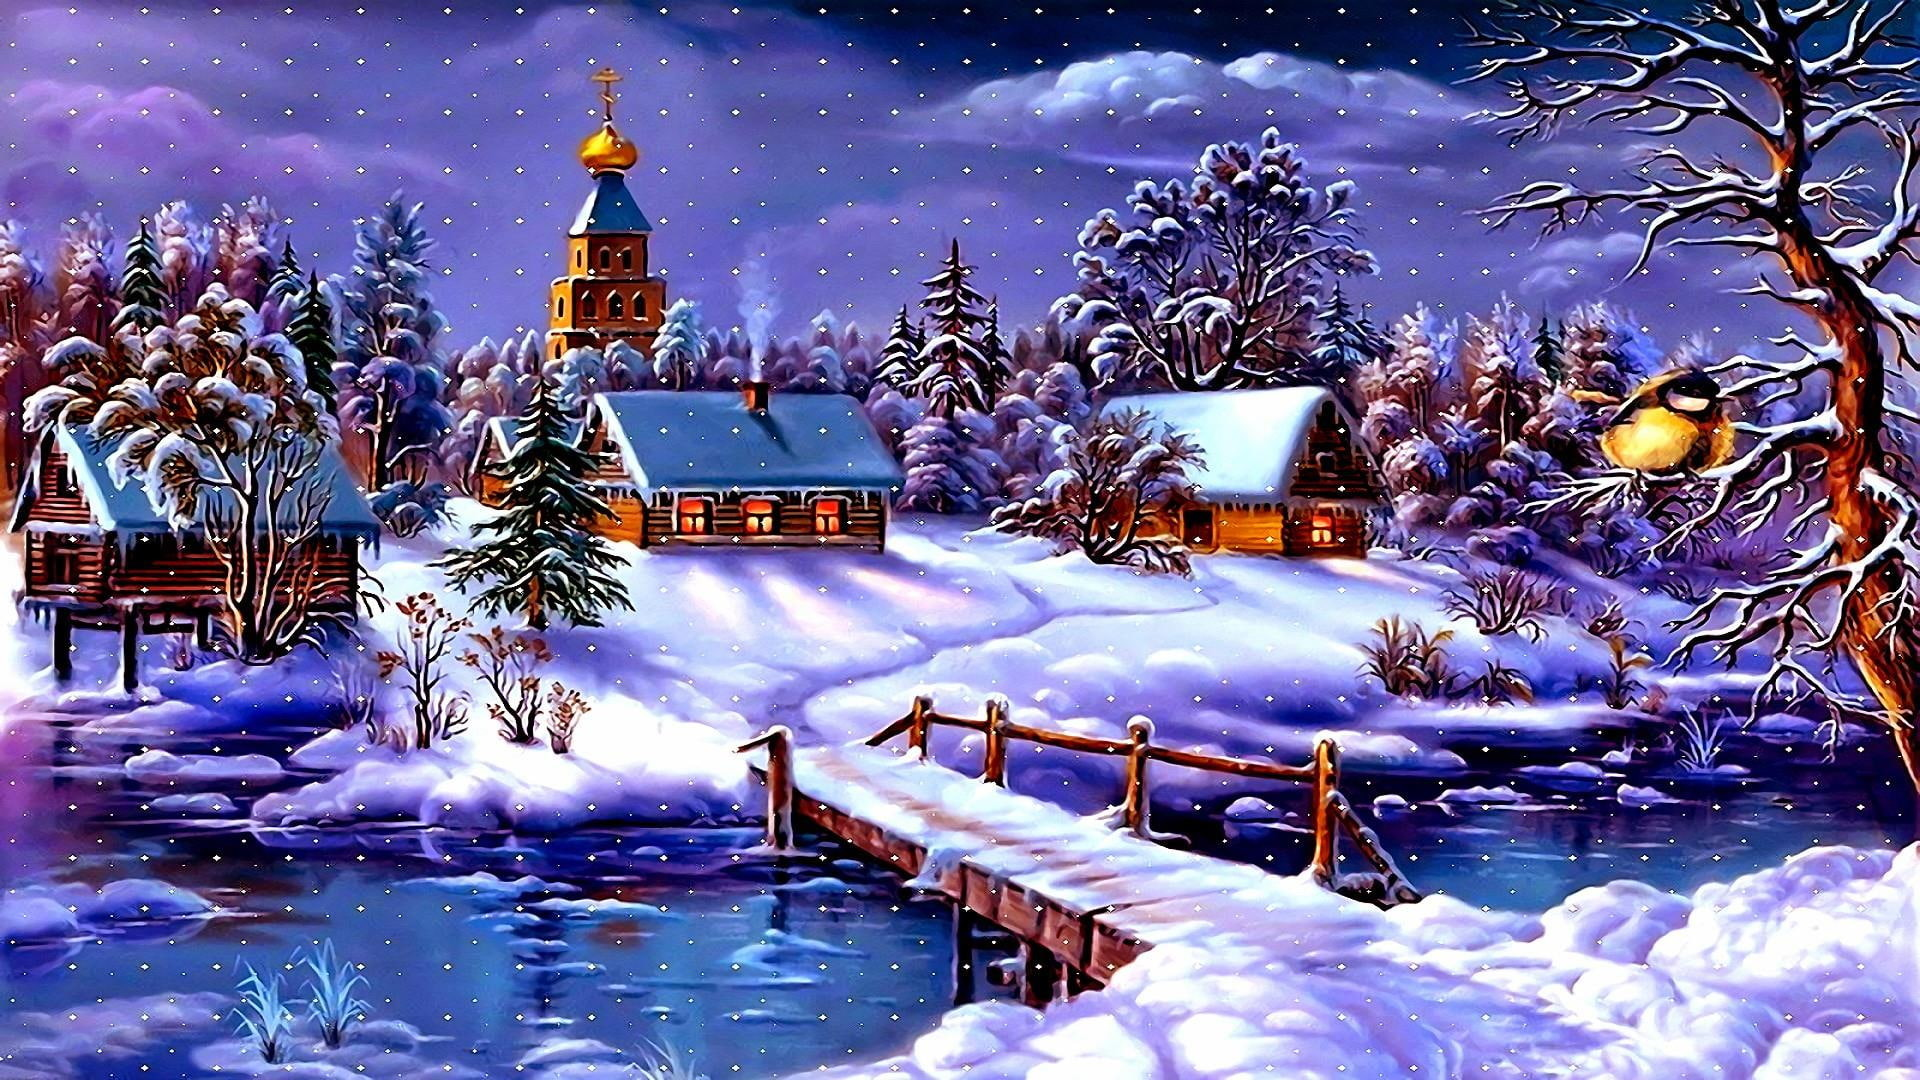 Res: 1920x1080, art, snowy, houses, snowfall, snowing, church, arctic, freezing